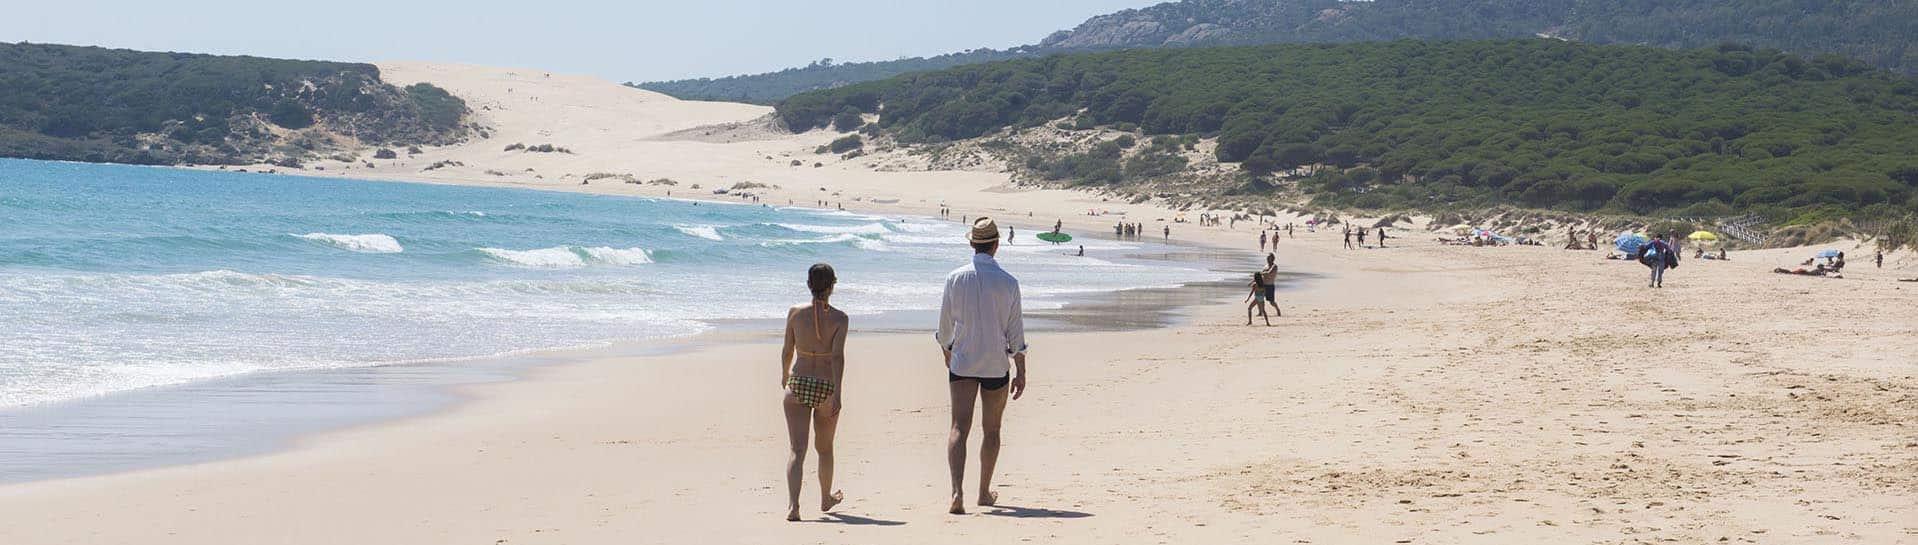 Bolonia-stranden i Andalucia